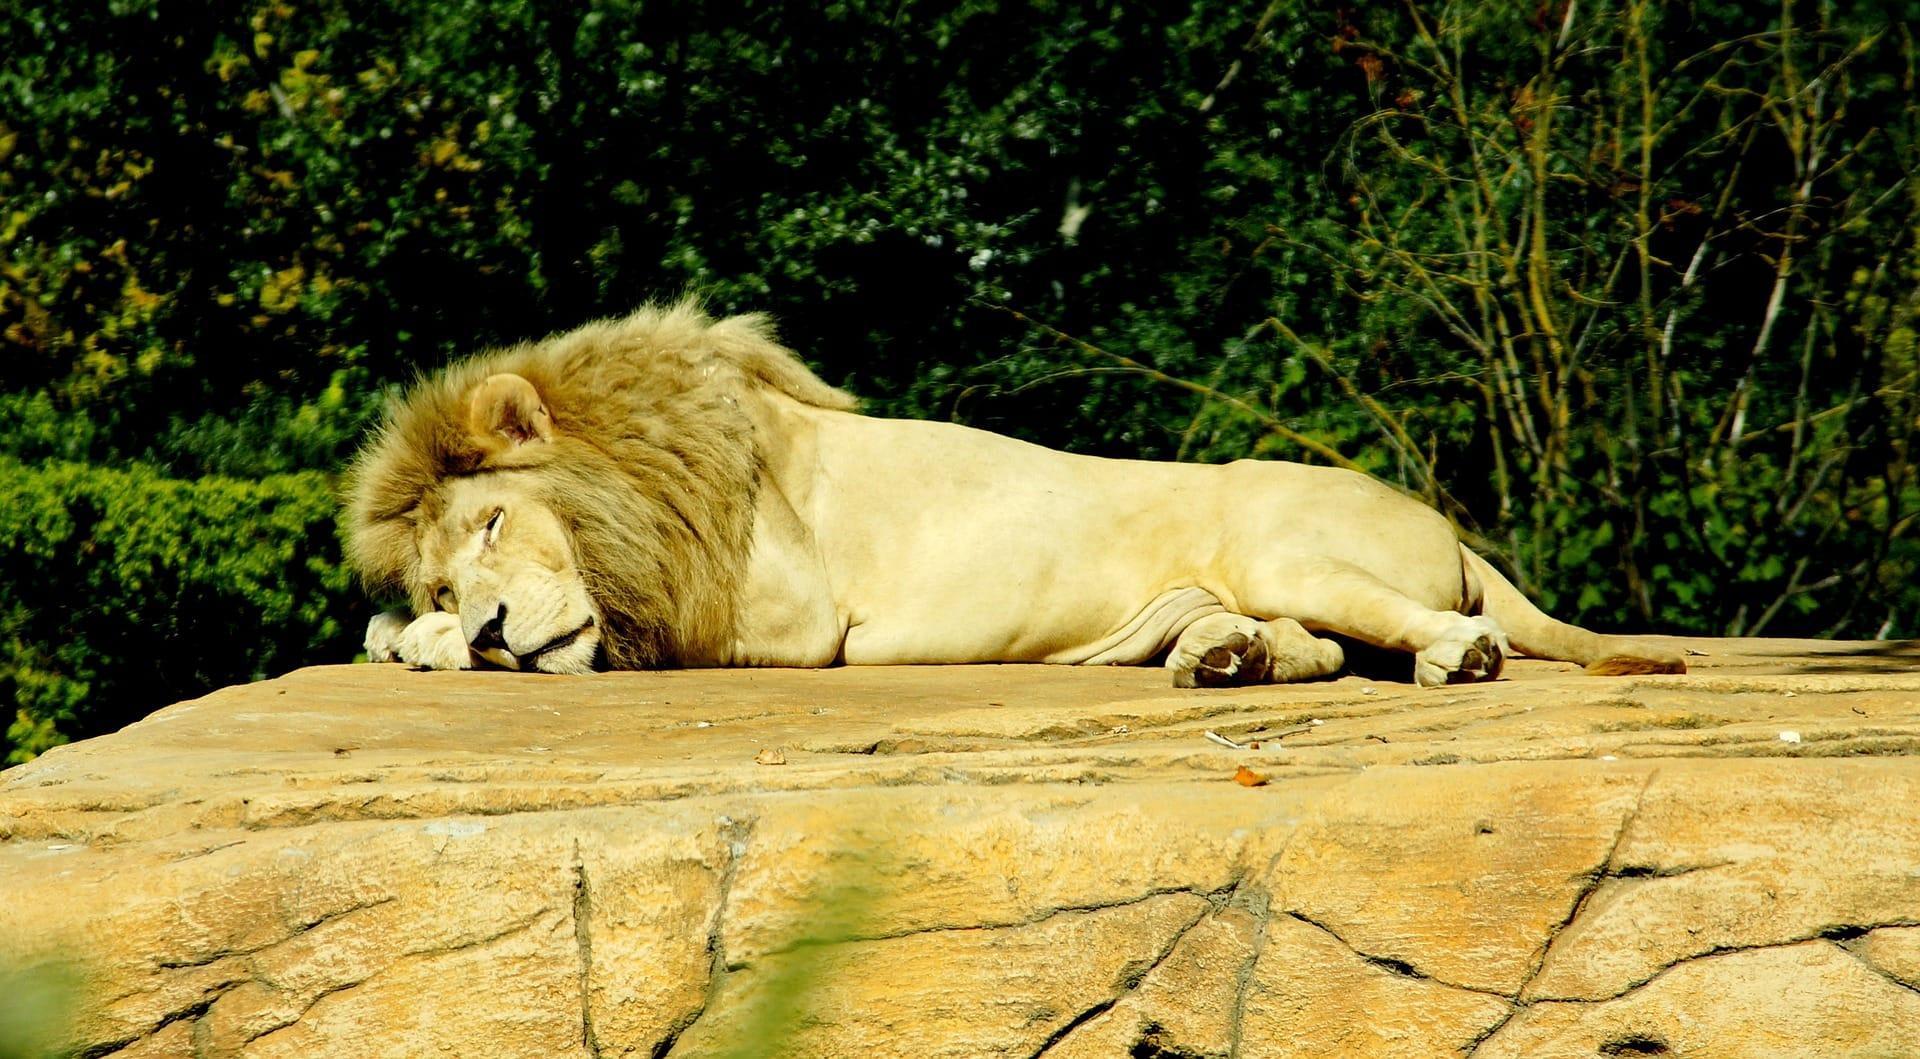 lion-1404074_1920.jpg